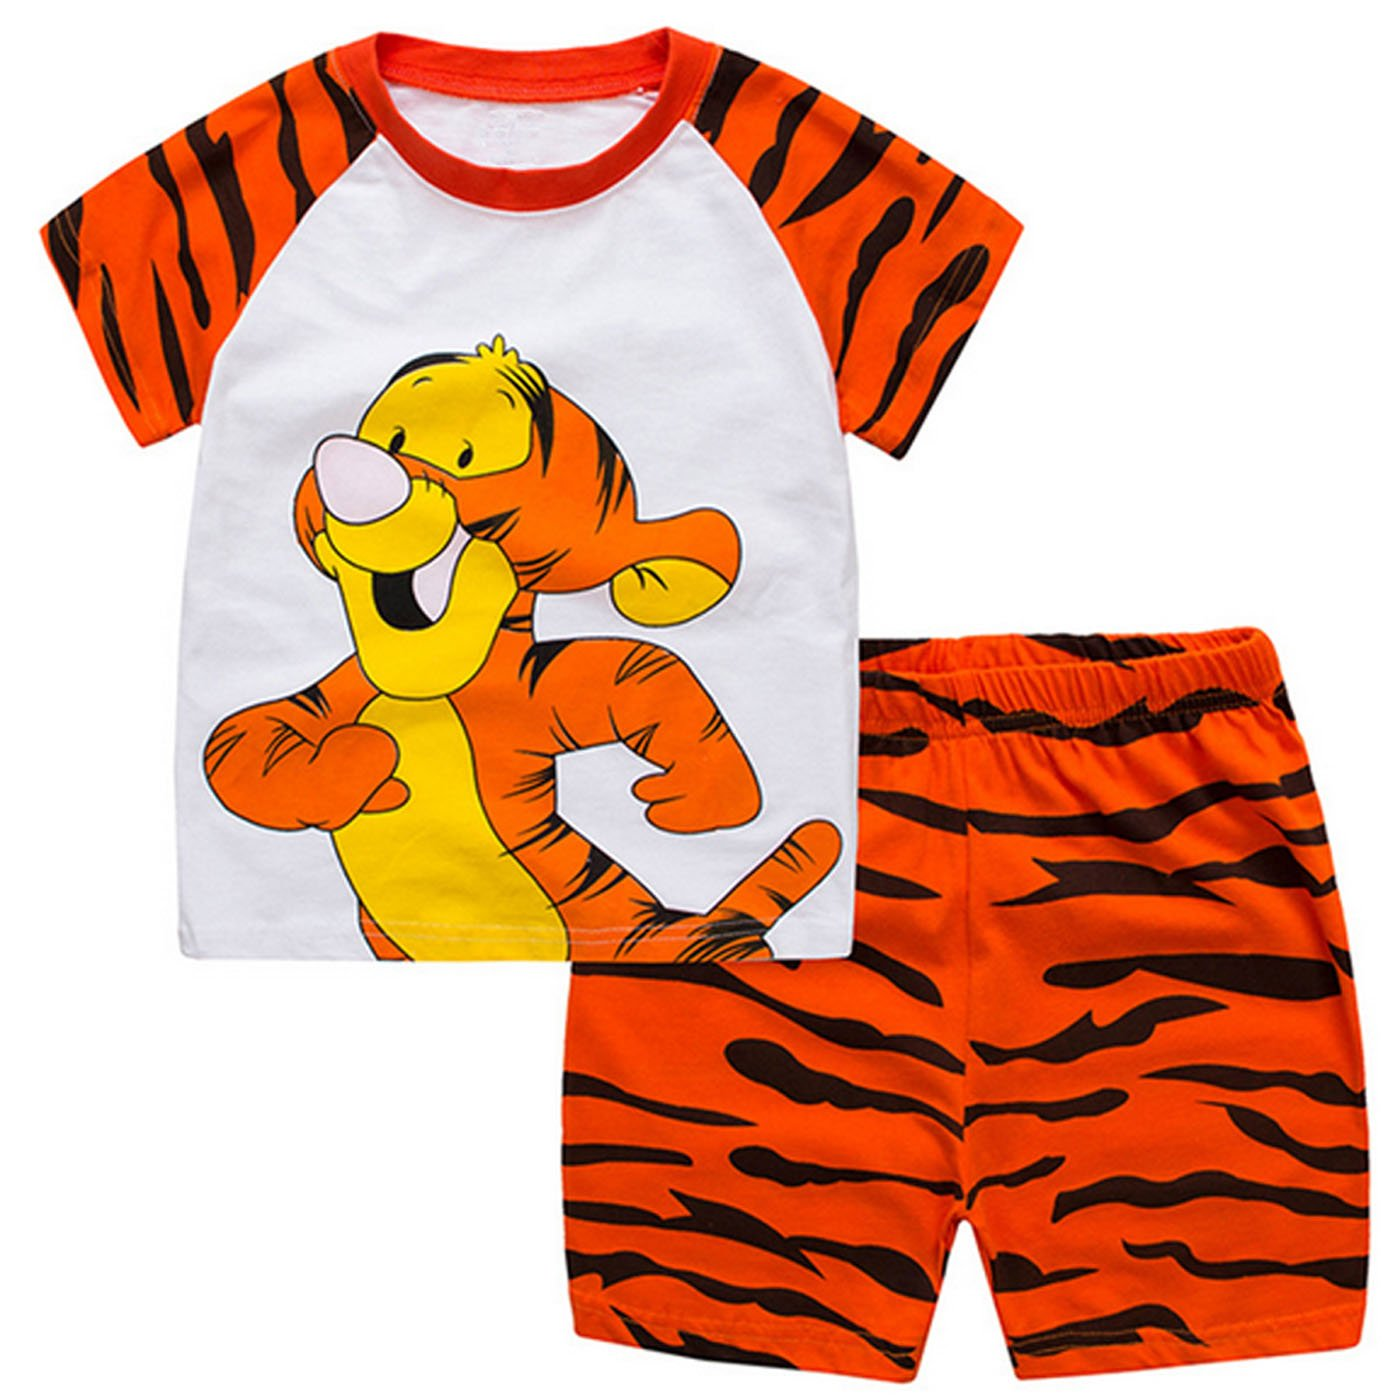 Kevin's Mart 68 Boys Pajamas Dinosaur and Tiger Little Kid Shorts Set 100% Cotton Sleepwear Toddler PJS